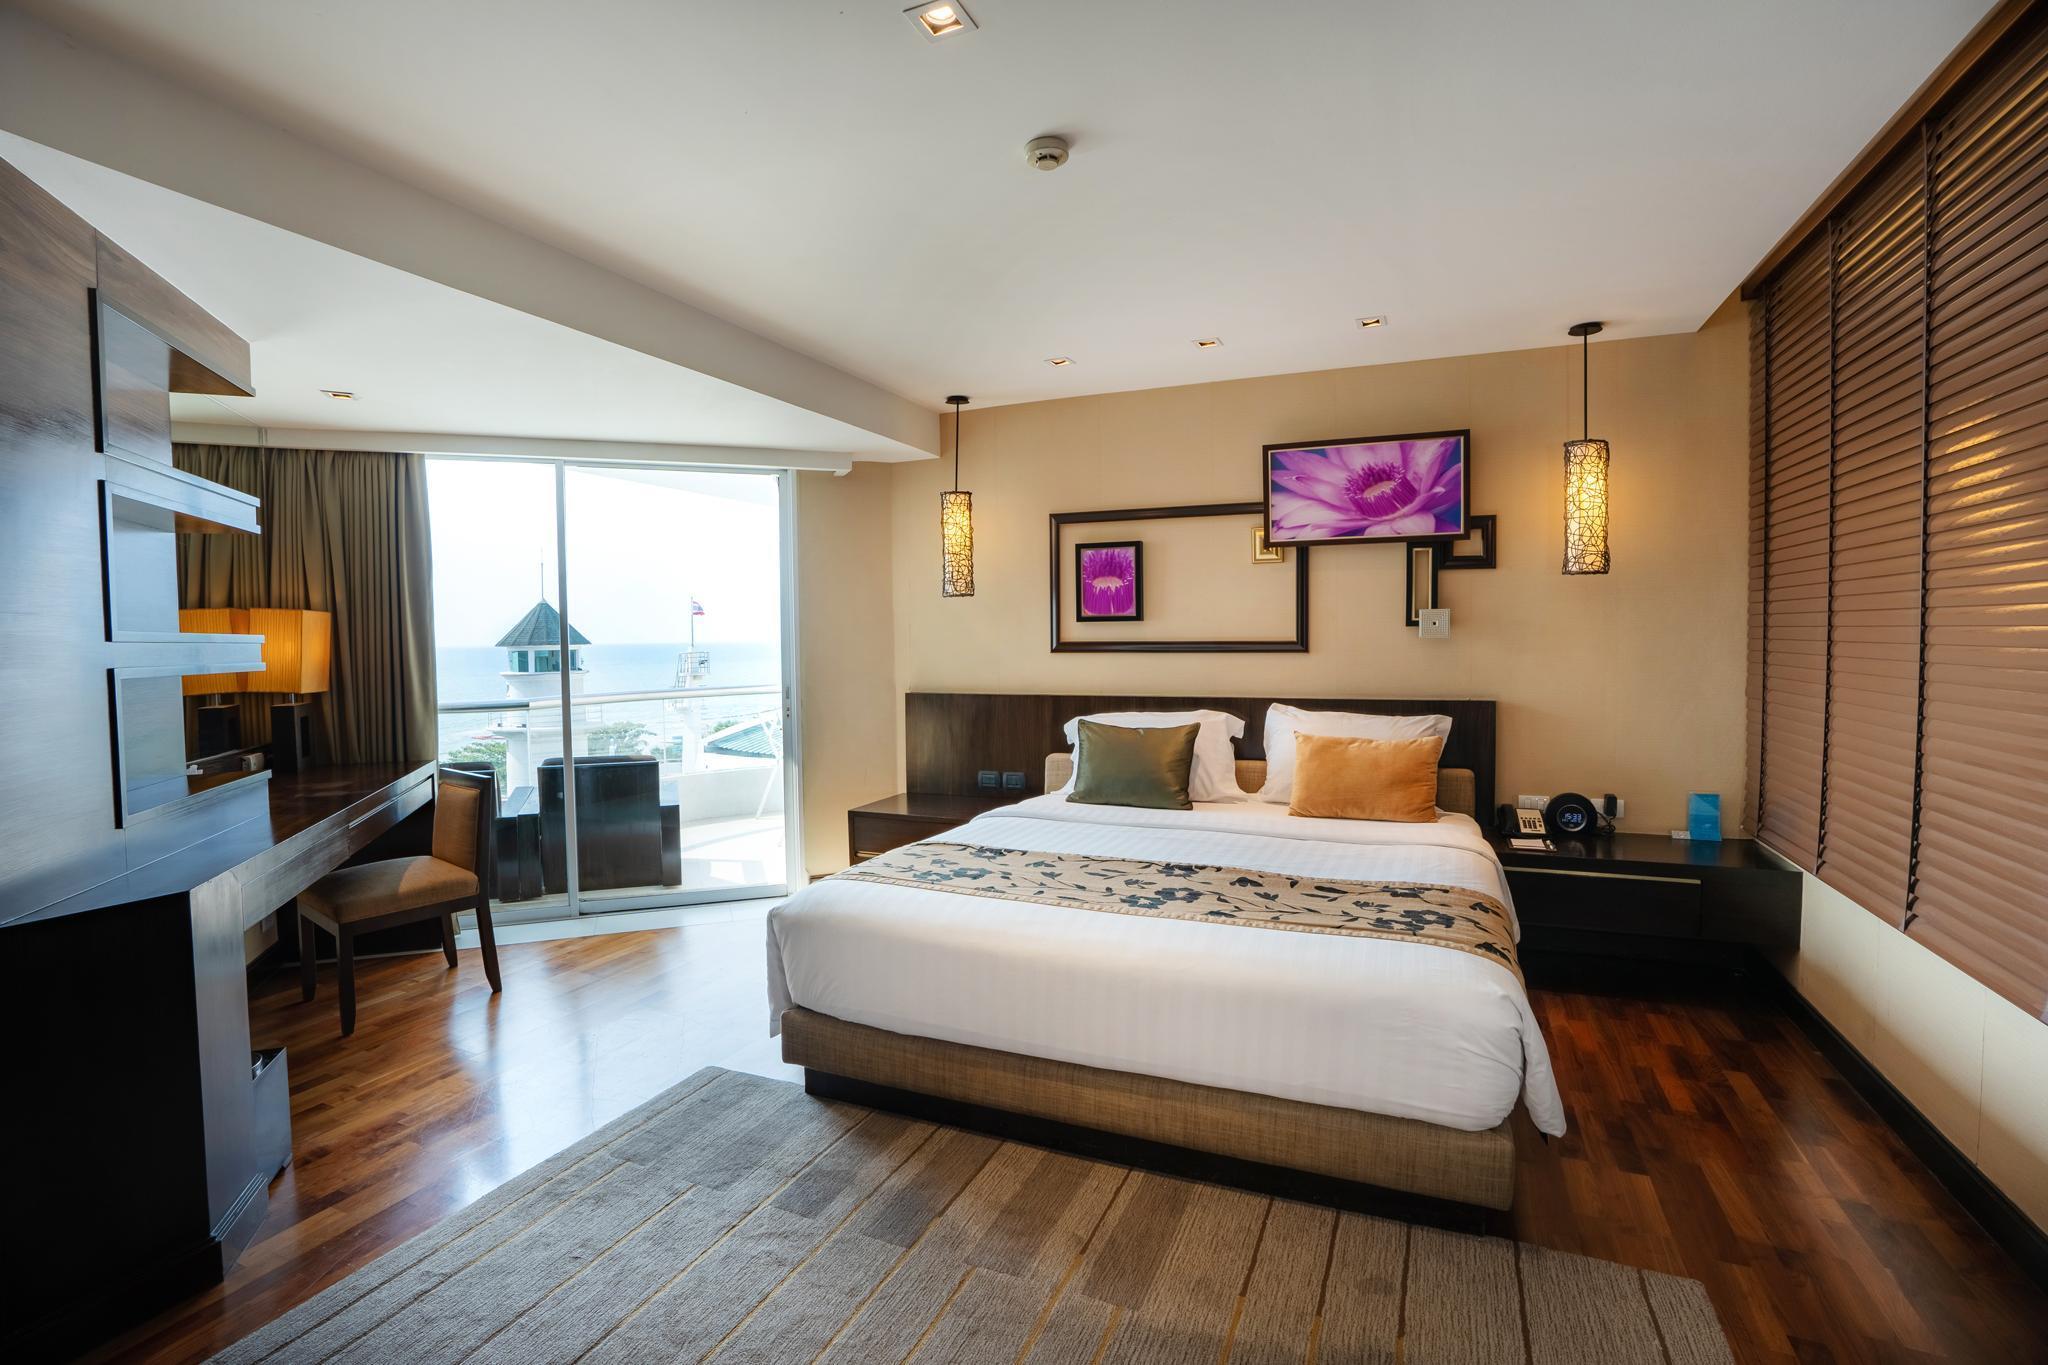 A-One Pattaya Beach Resort, Pattaya